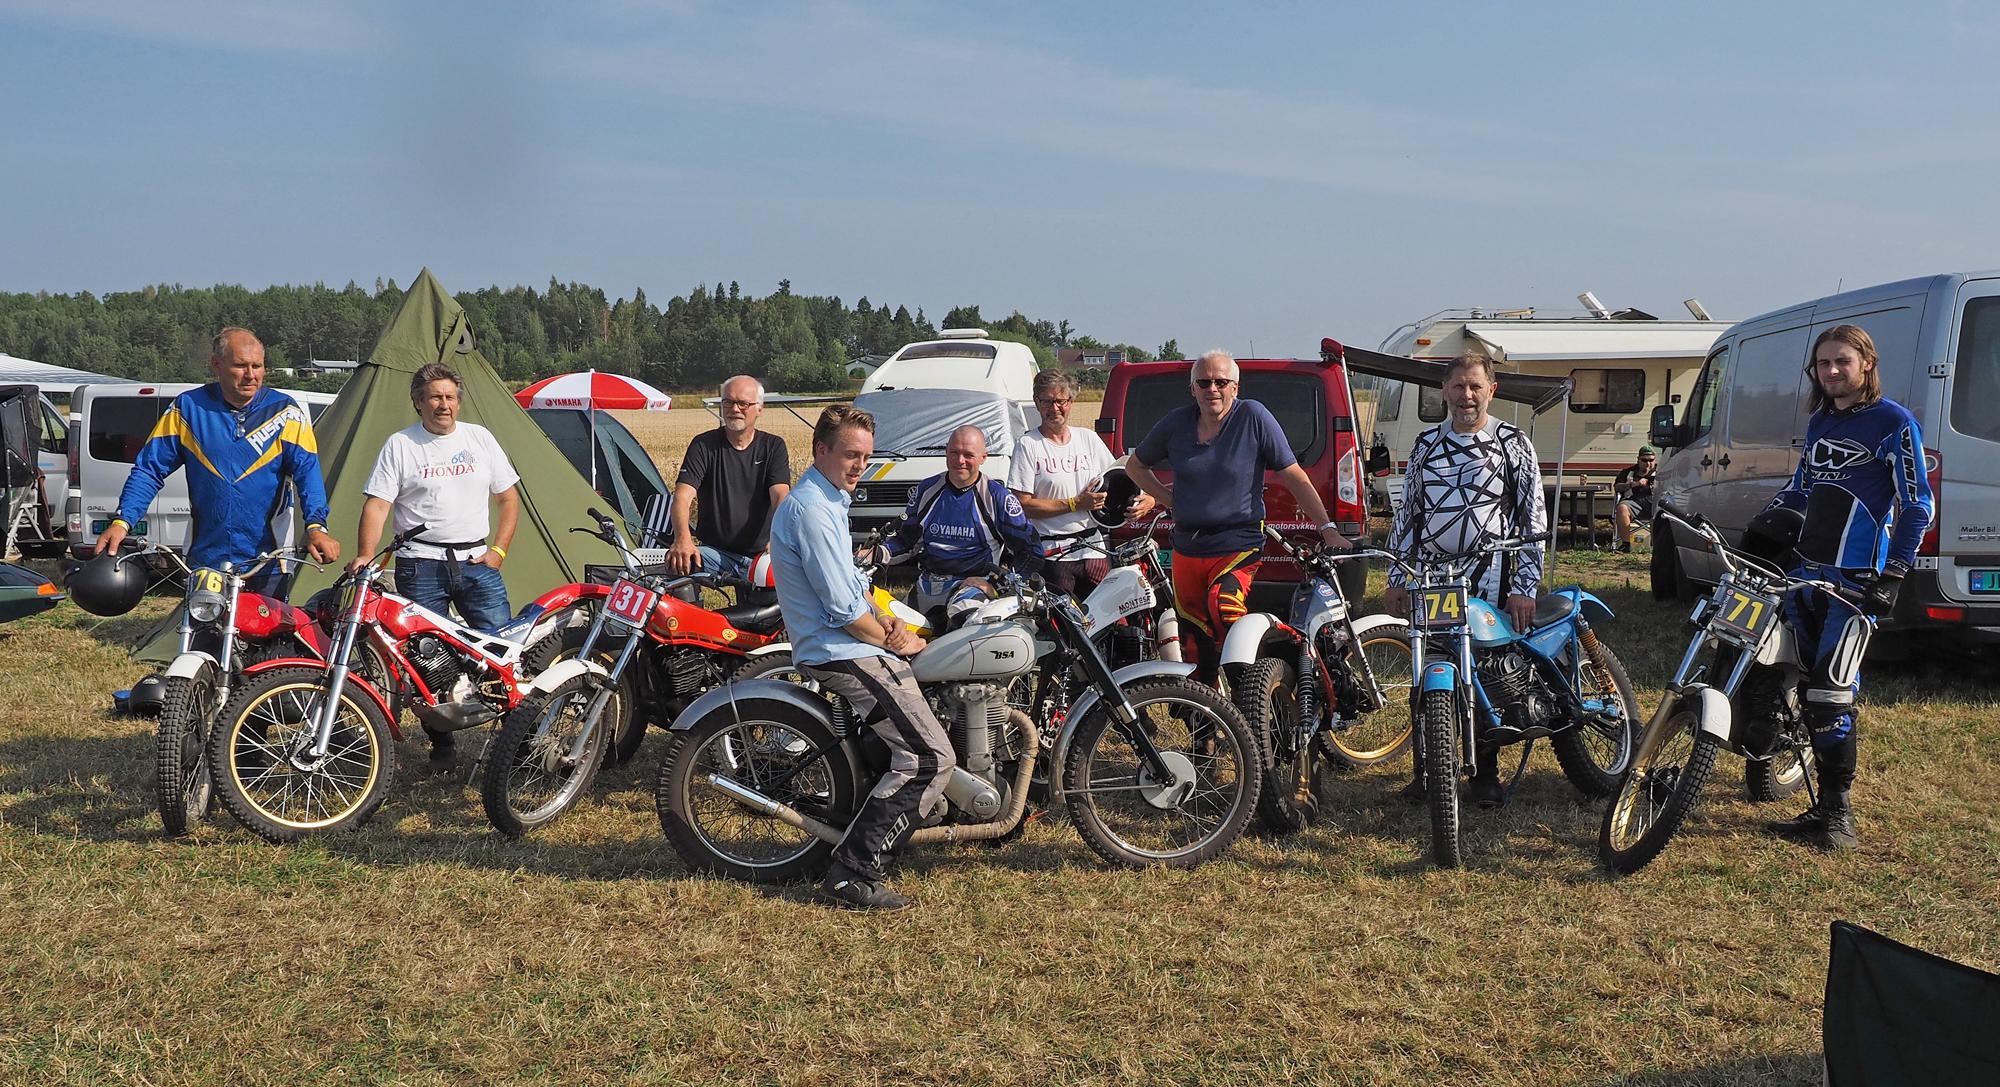 På bilde fra venstre: Rolf Berven, Per Erik Syverstad, Jarle Stensby, Eskil Broen, Helge Ruden, Tore Aarvold, Petter Kristoffersen, Arne Petter Morstad og Jesper Laursen.  foto:  Maarten Mager